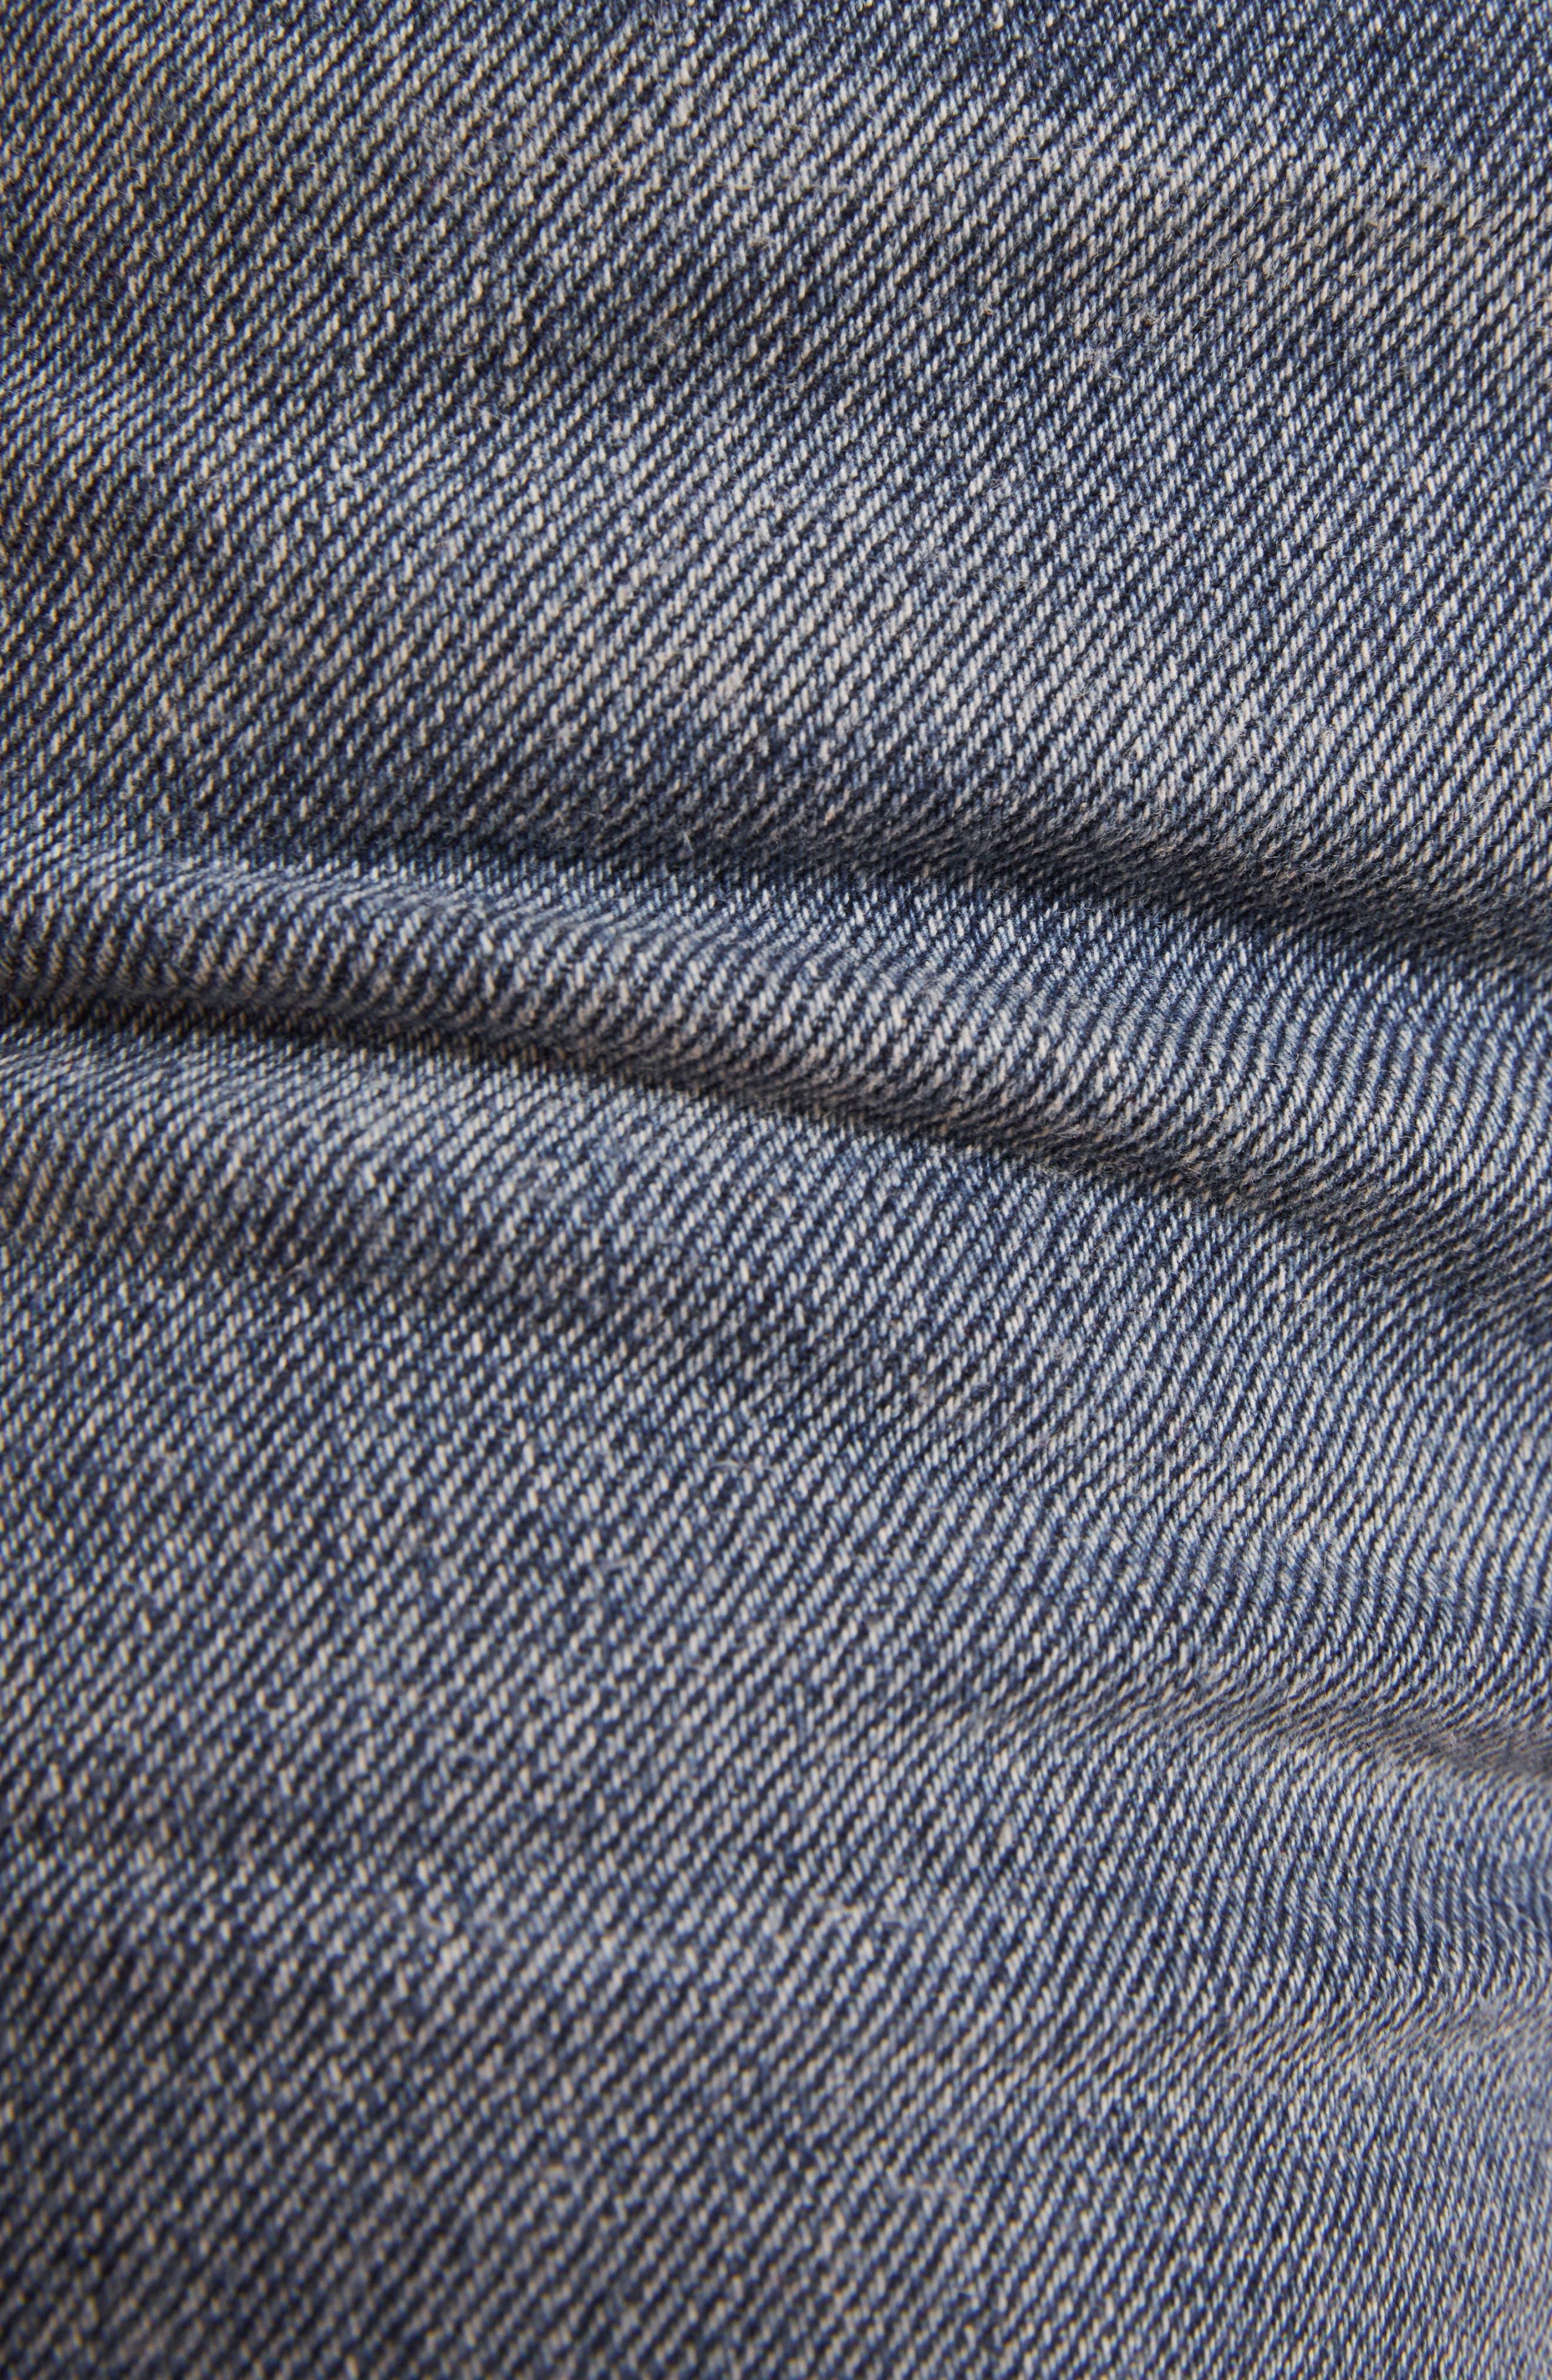 REFORMATION, Fawcett High Waist Crop Jeans, Alternate thumbnail 4, color, CELTIC